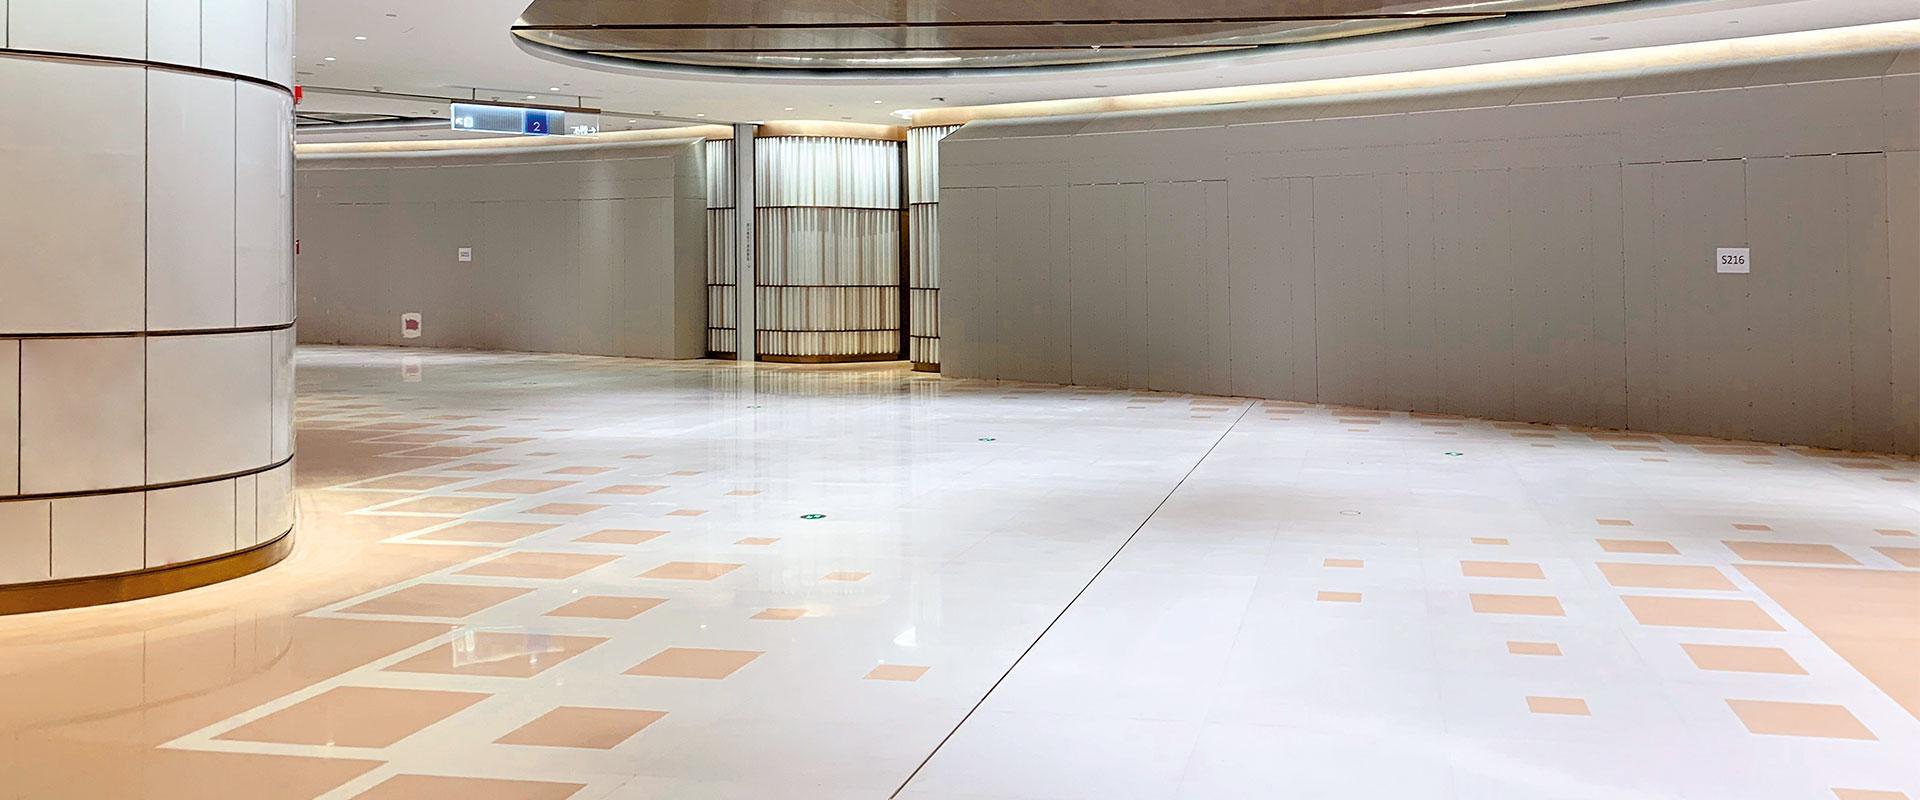 bfc-mall---shanghai-cina---SB-138-SB-137-SB-149-SB-139---retail-03---OK